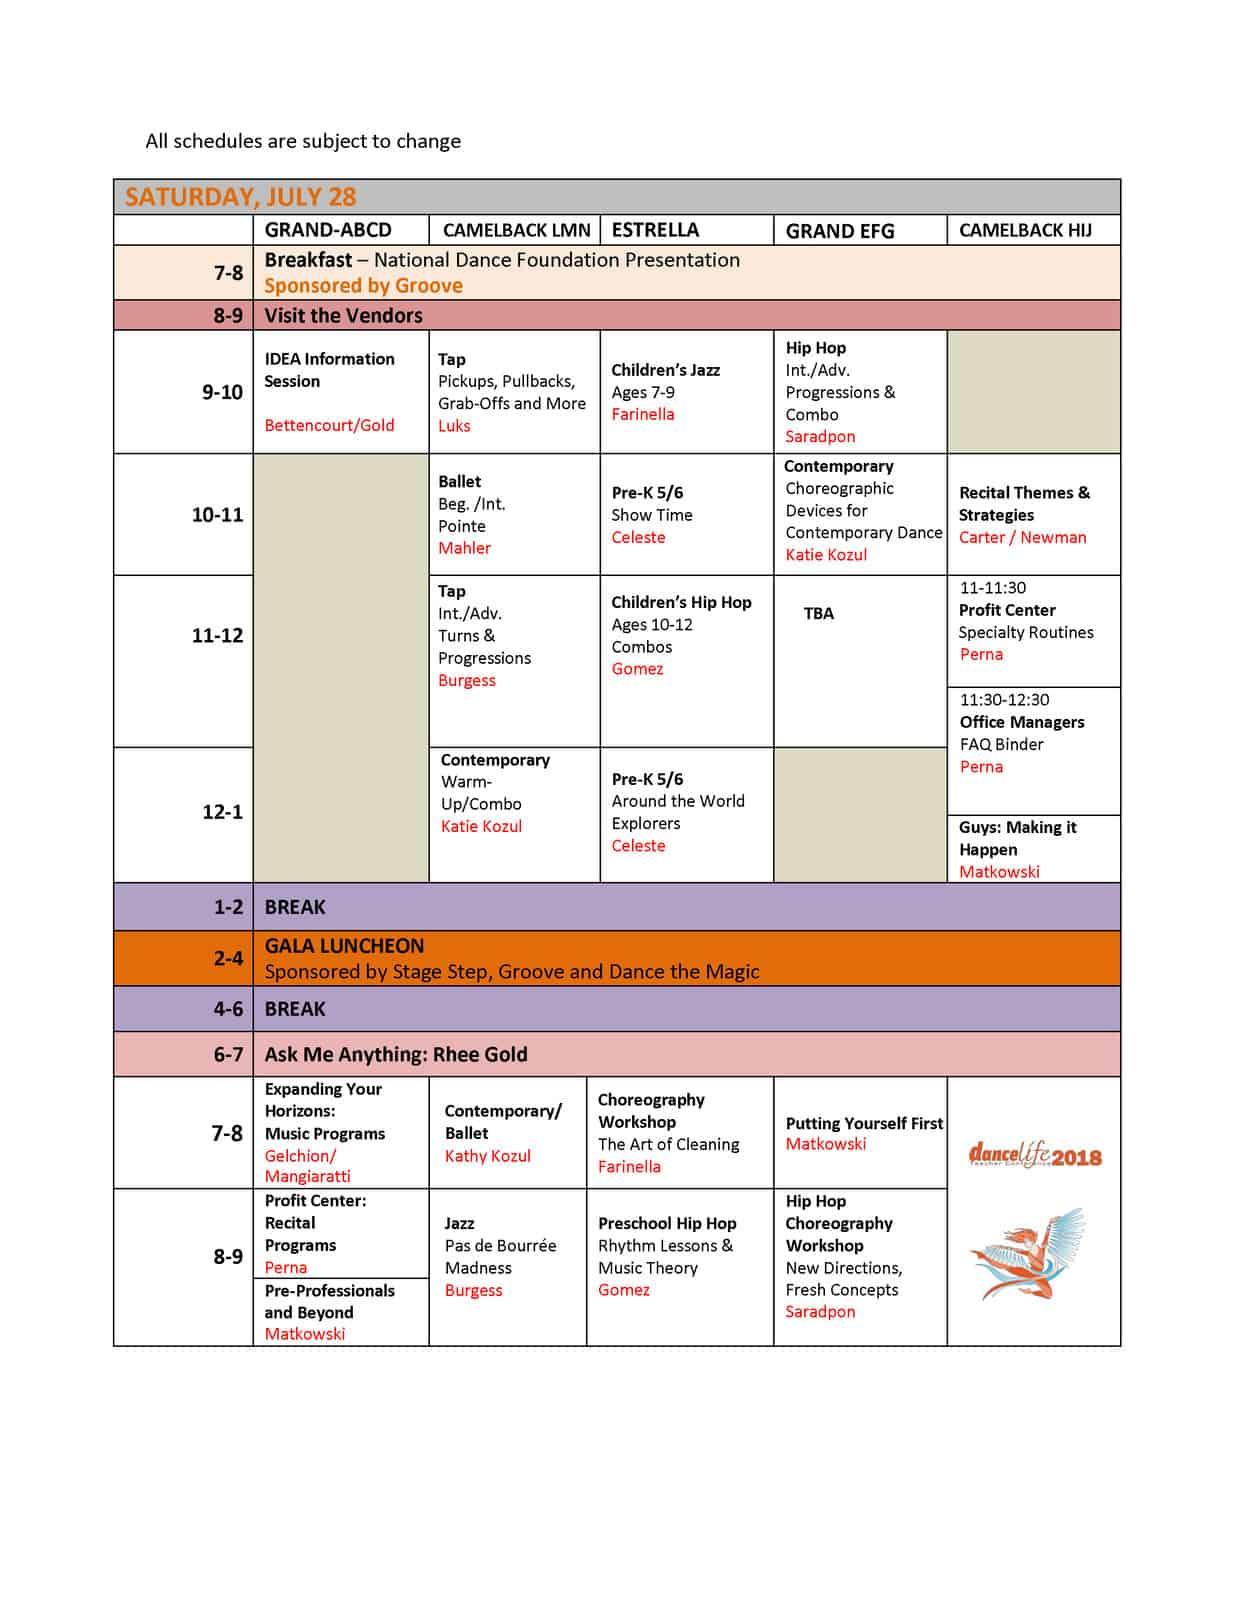 DLTC Schedule 2018_Page_2